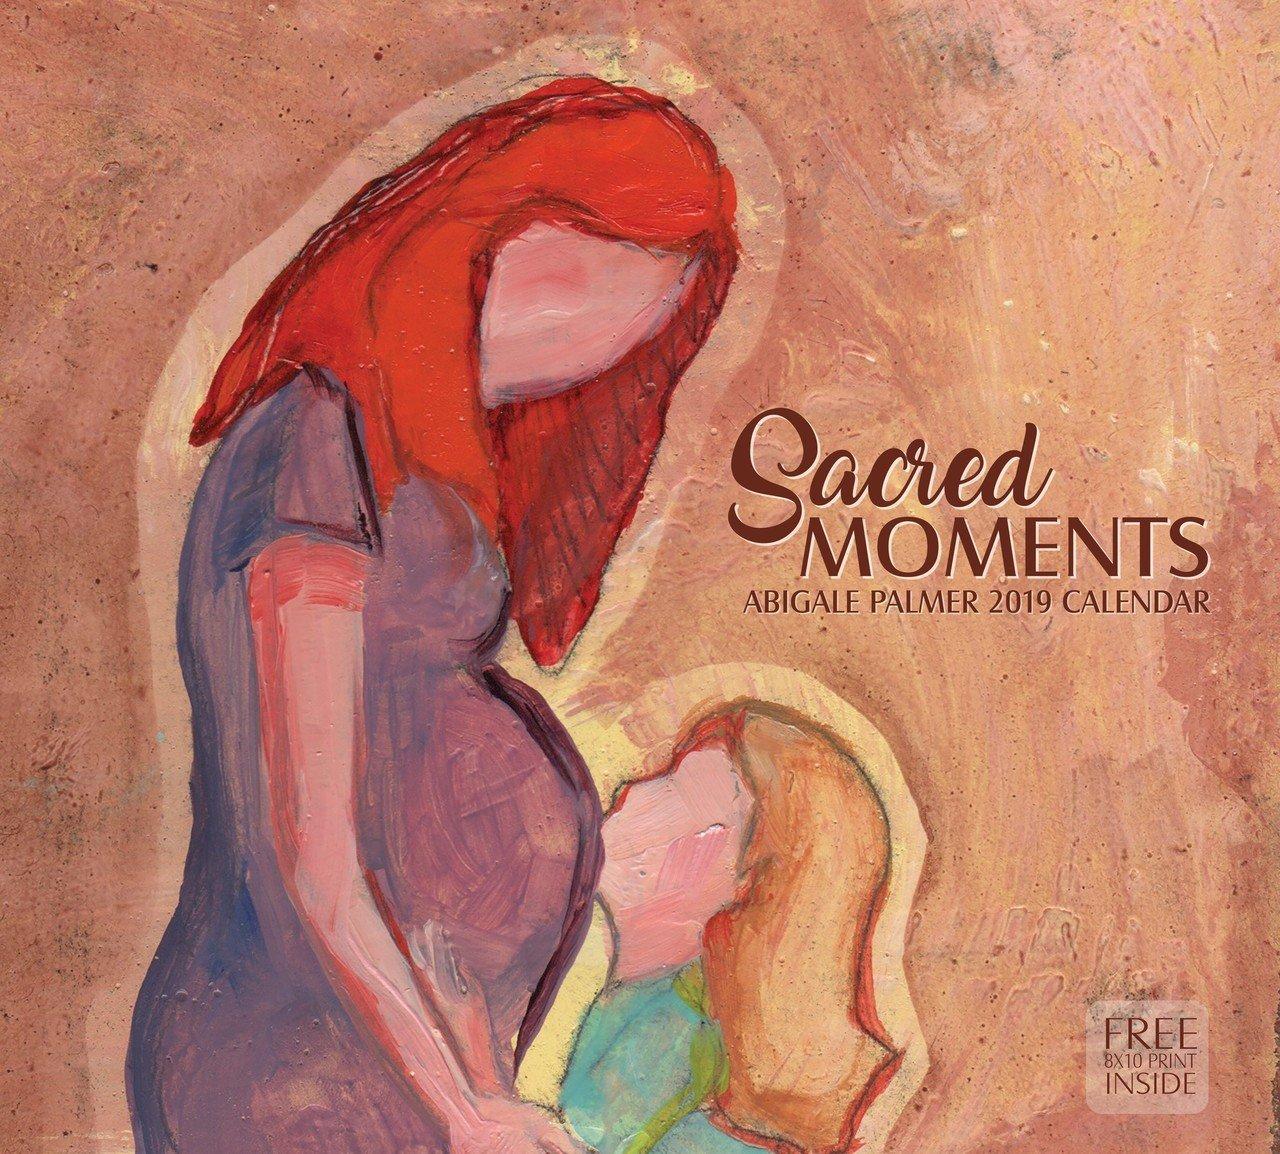 2019 Abigale Palmer Calendar - Sacred Moments